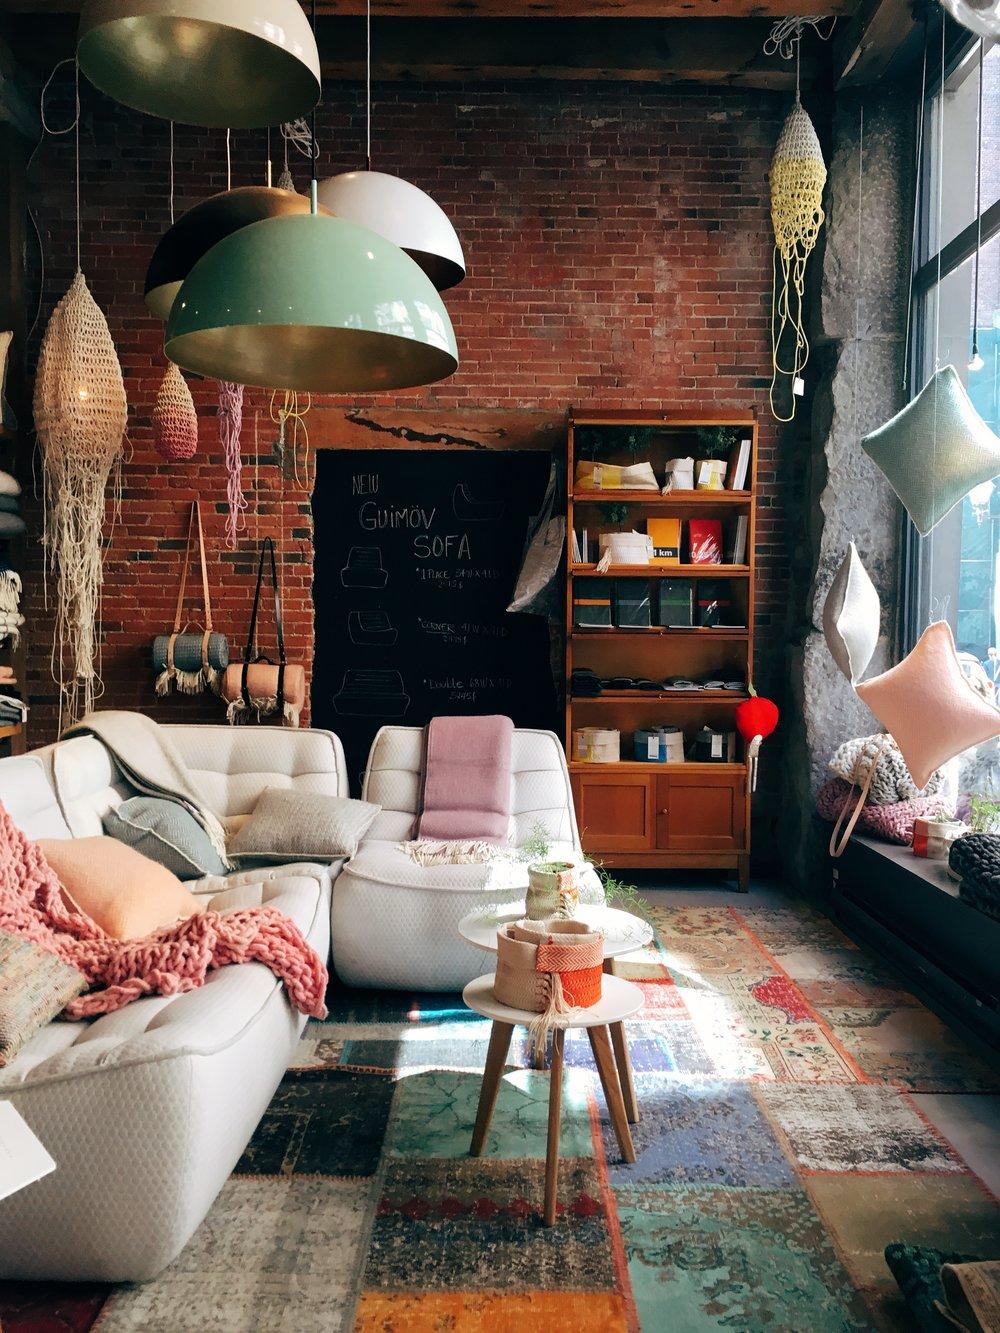 furniture.jpeg